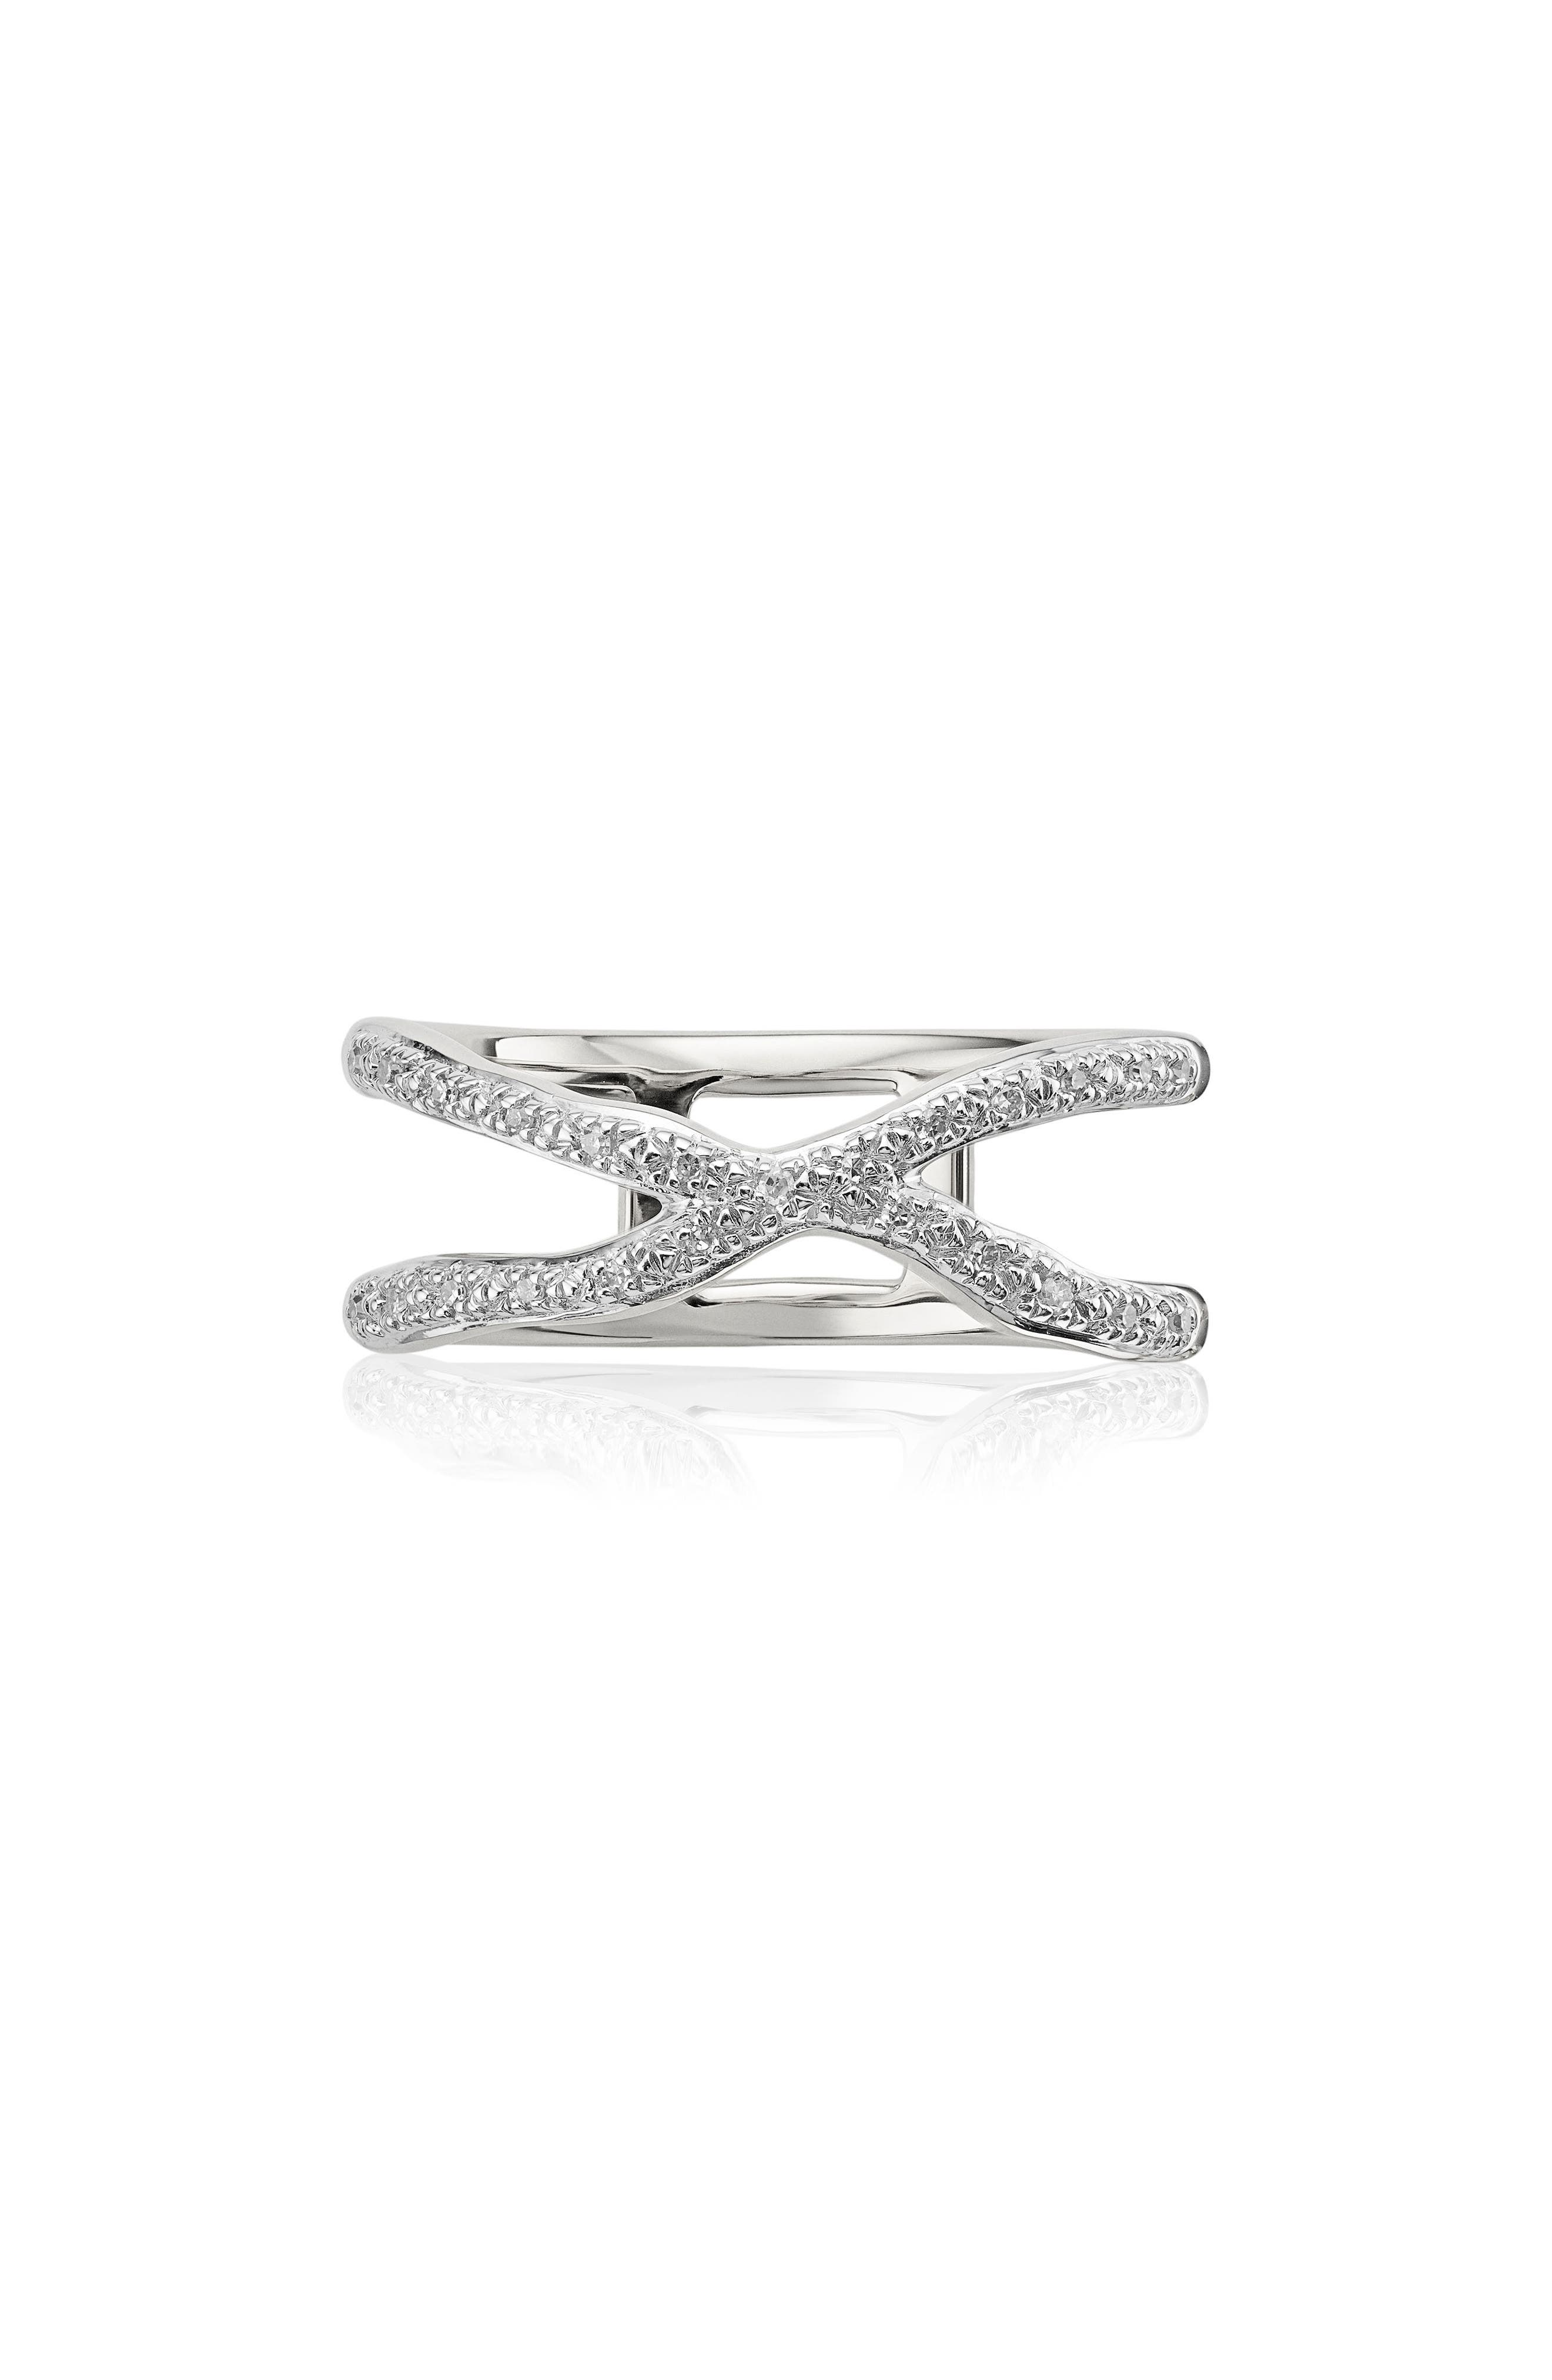 Riva Diamond Ring,                         Main,                         color, Silver/ Diamond